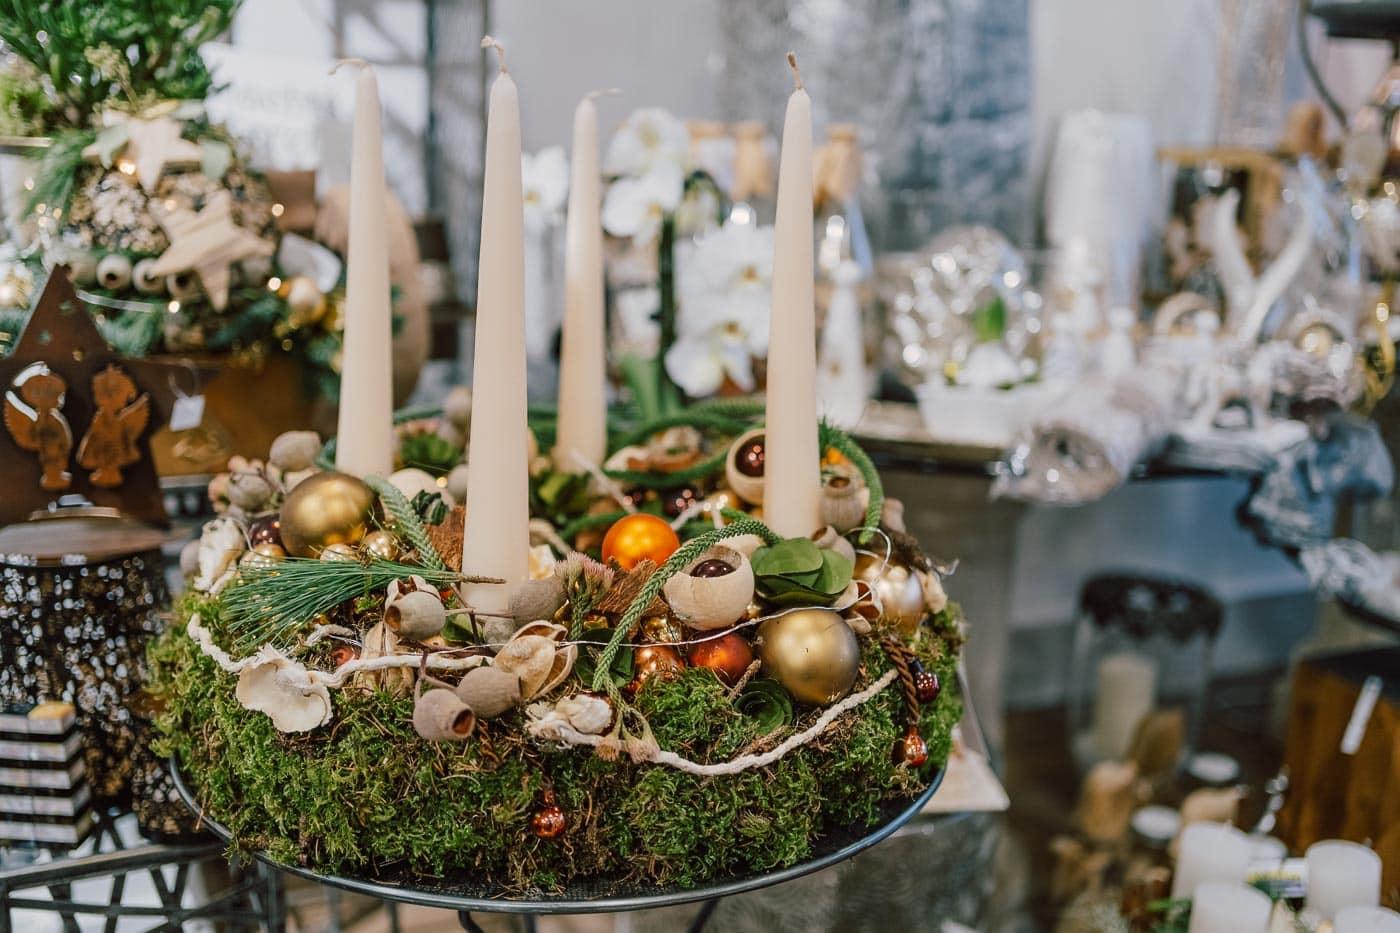 blumen-gaby-strohmeier-graz-saisonales-advent-1